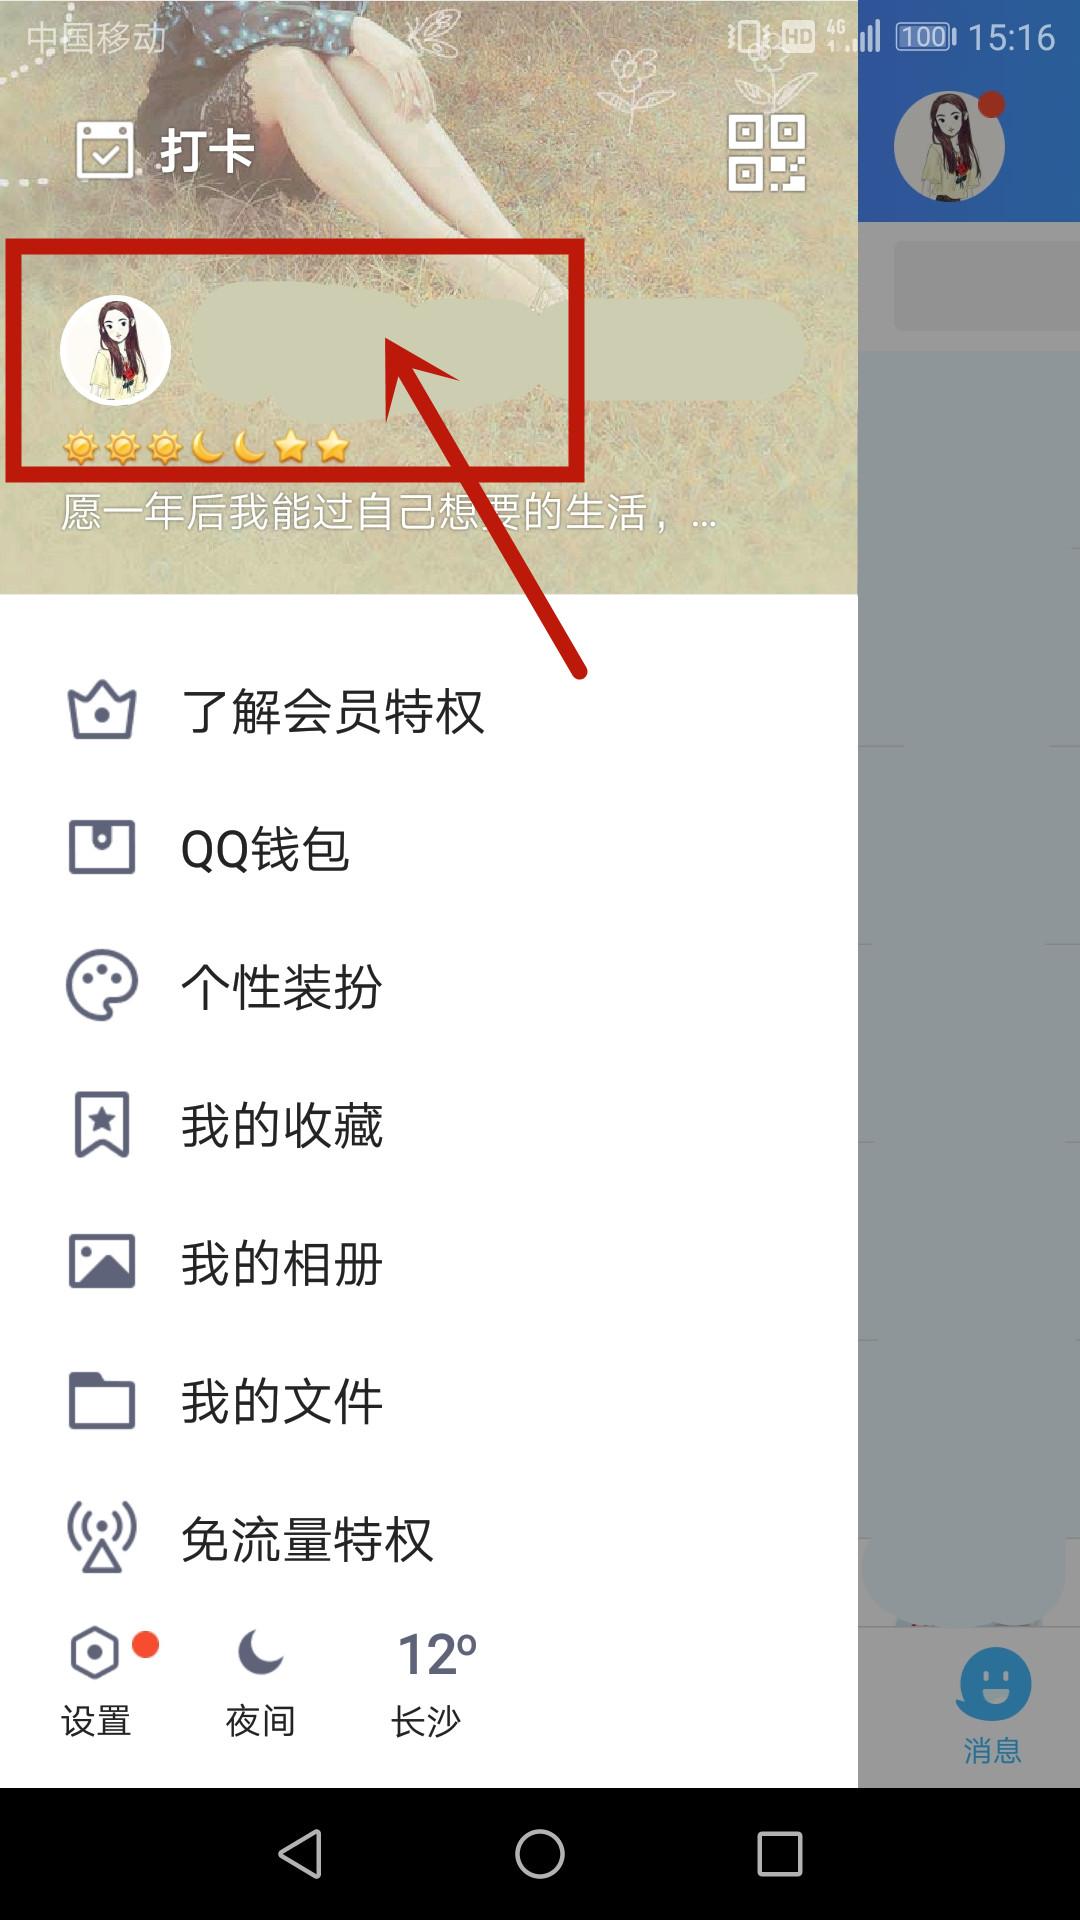 qq等级官方查看,怎样查看自己的QQ等级?